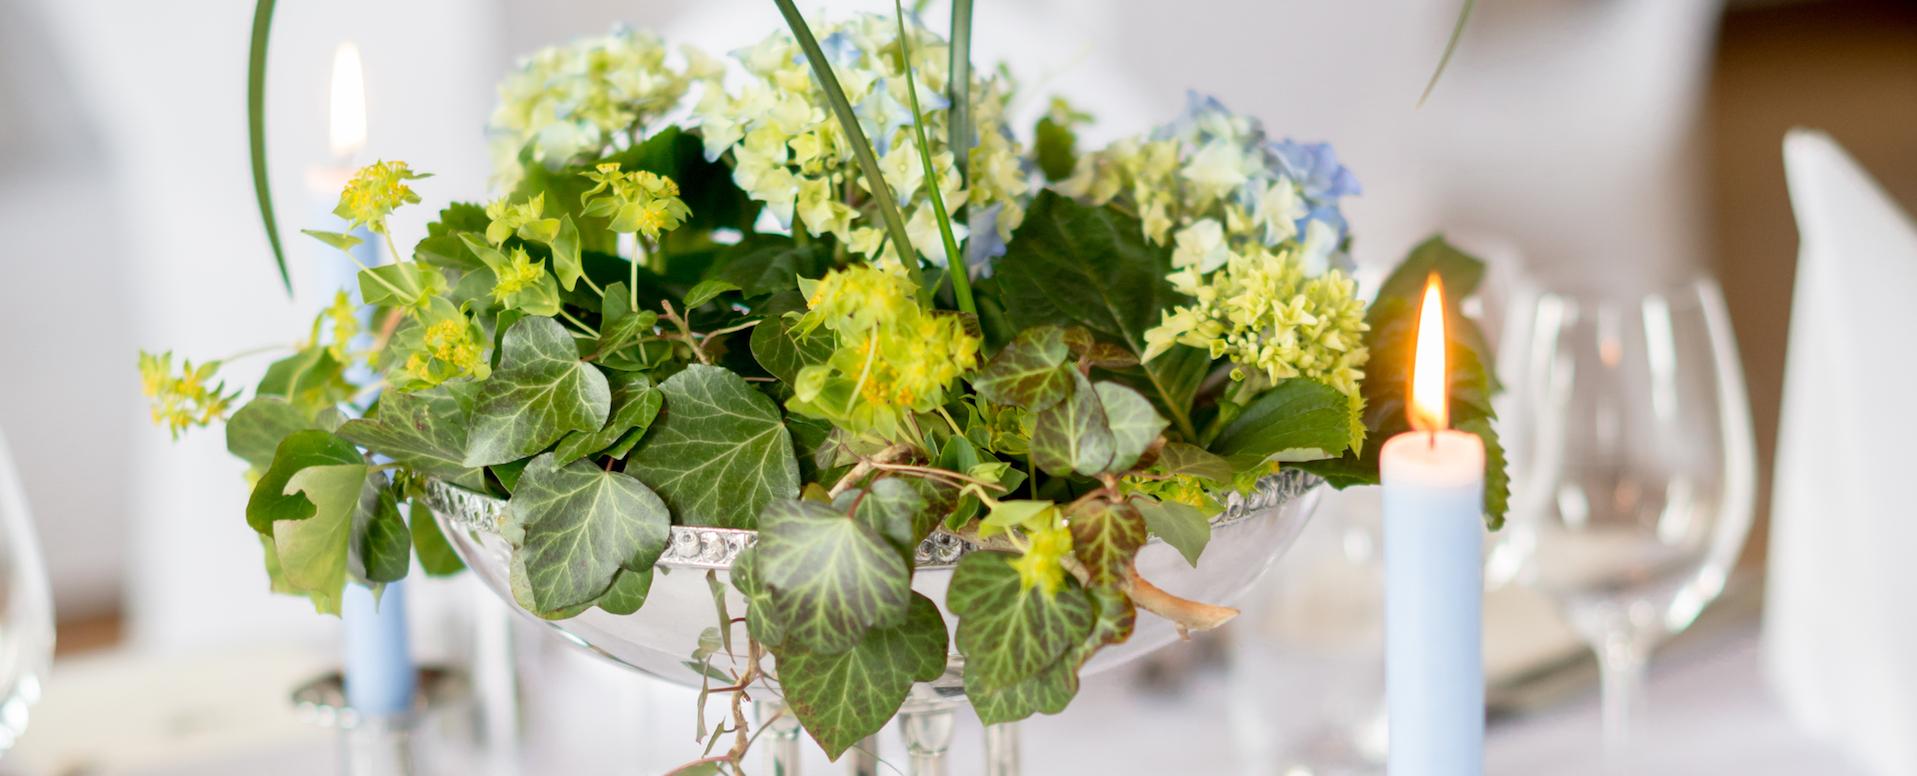 Blomsterarrangemang romantisk1920x775